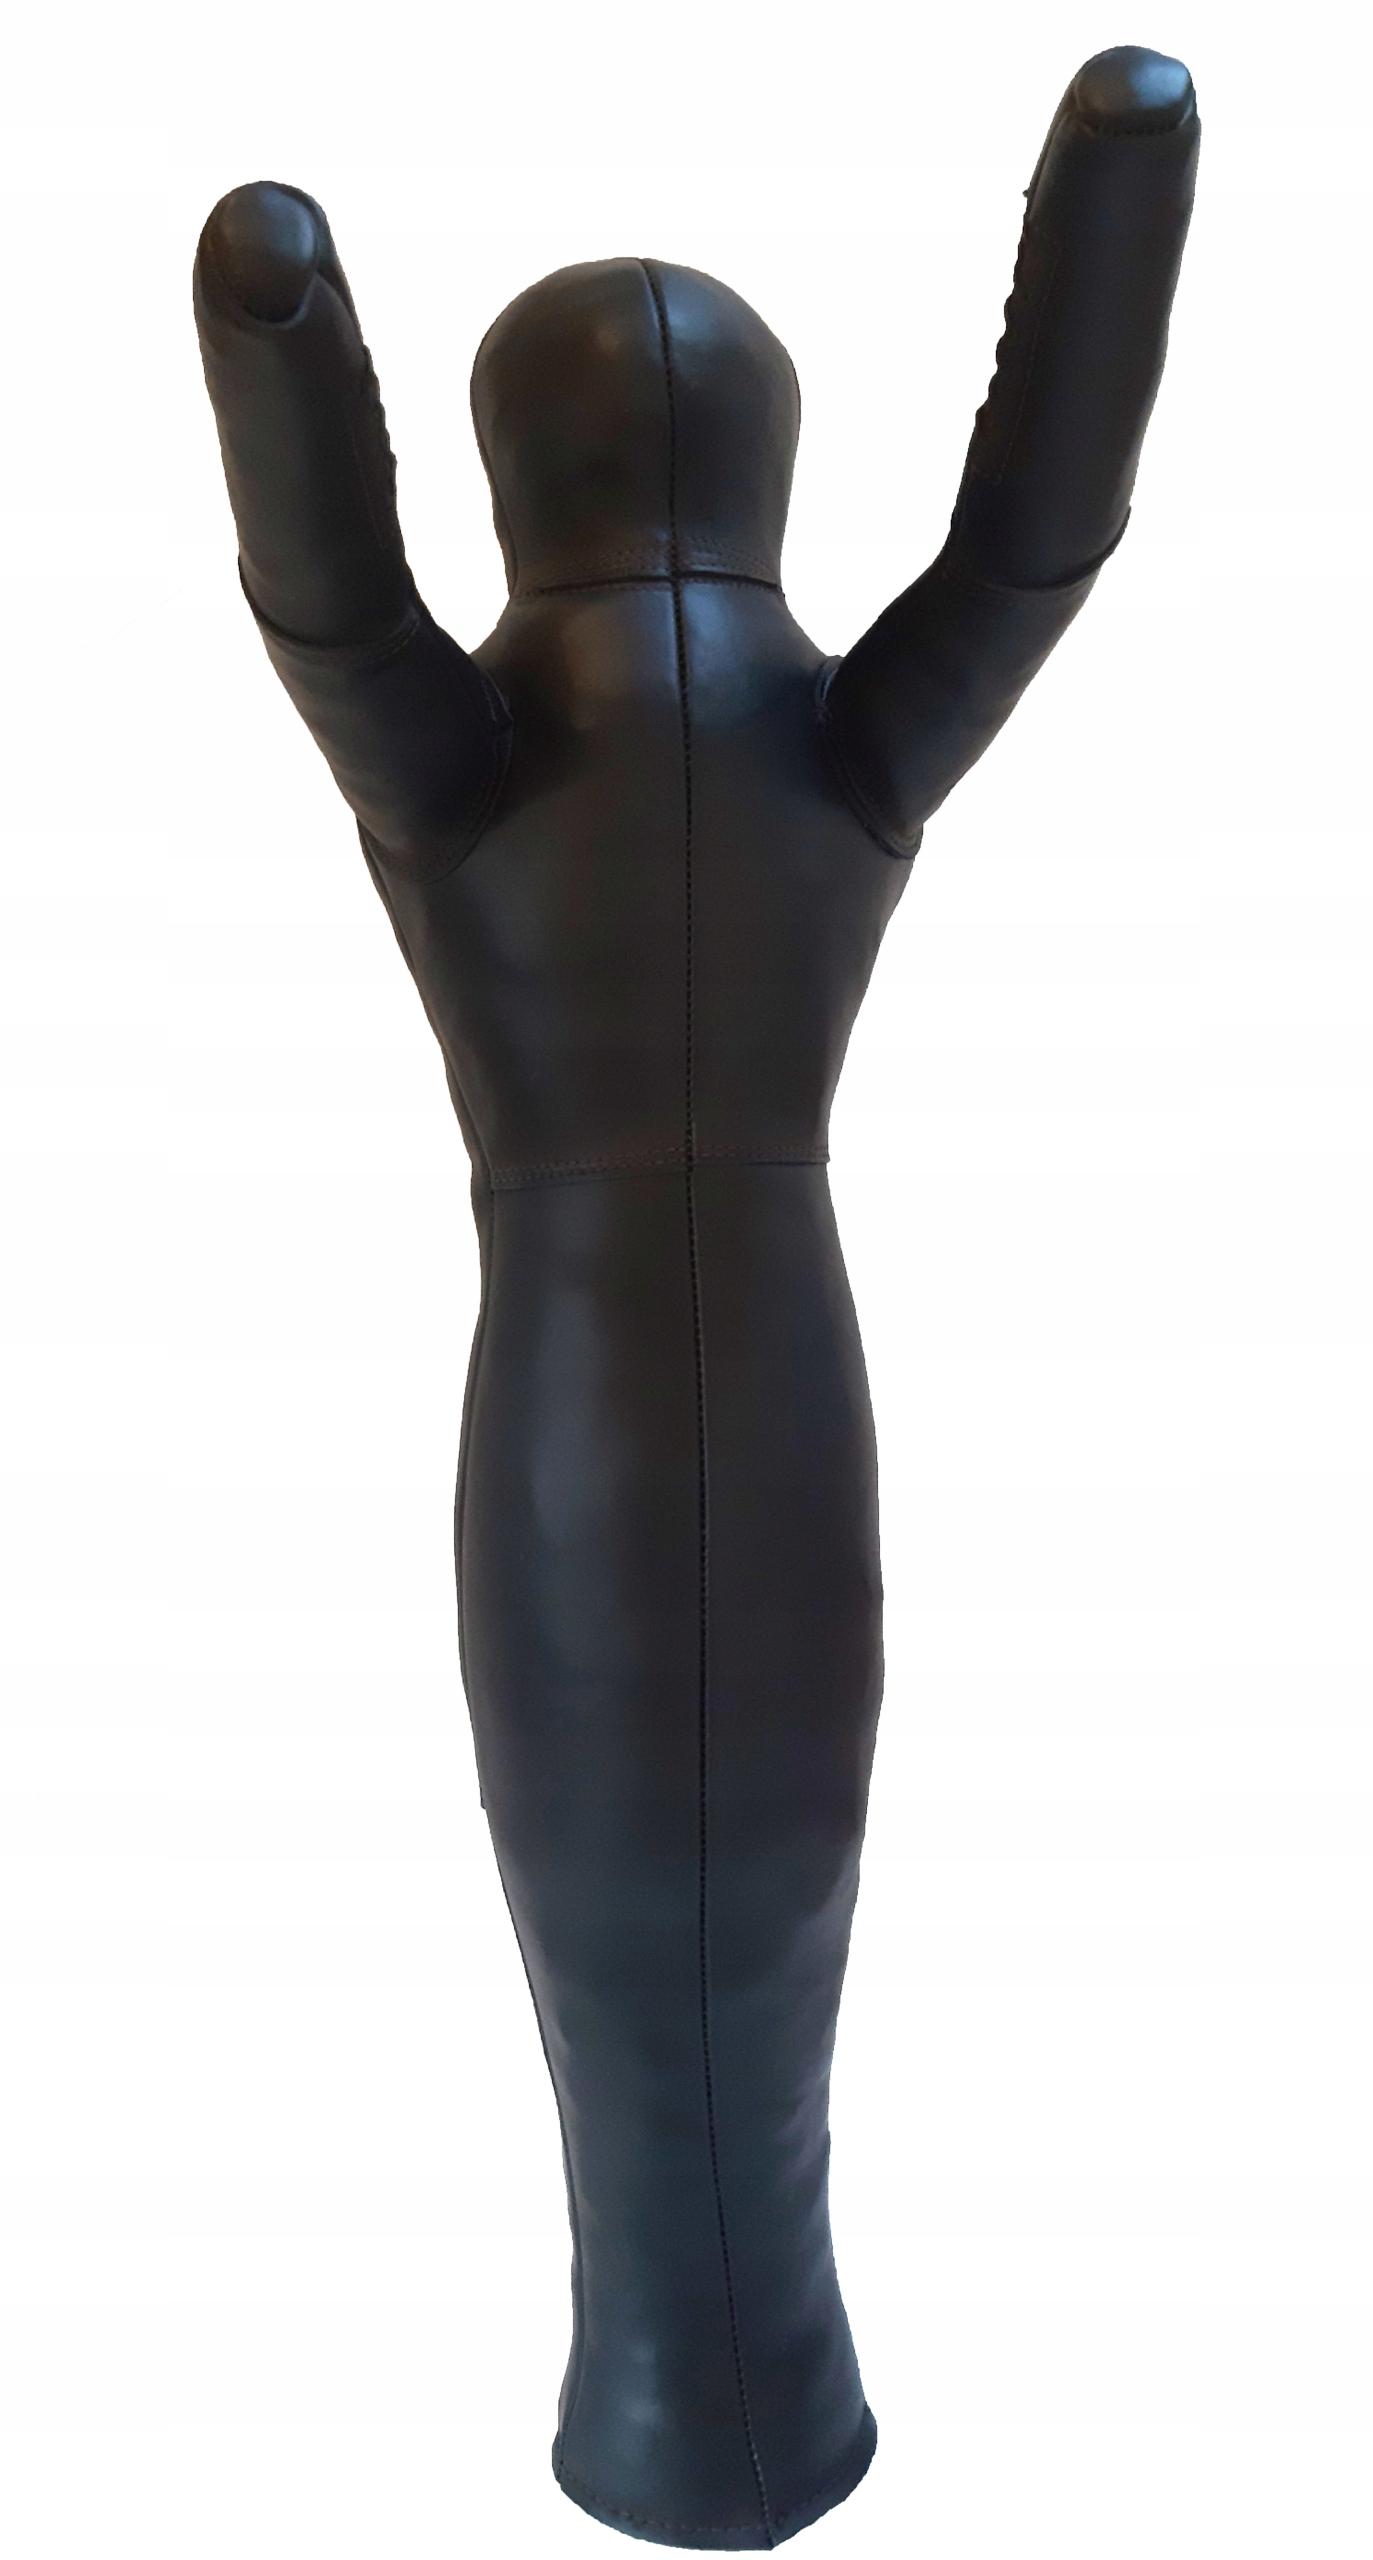 Mannequin Wrestling 120cm / 16kg. Single Koža